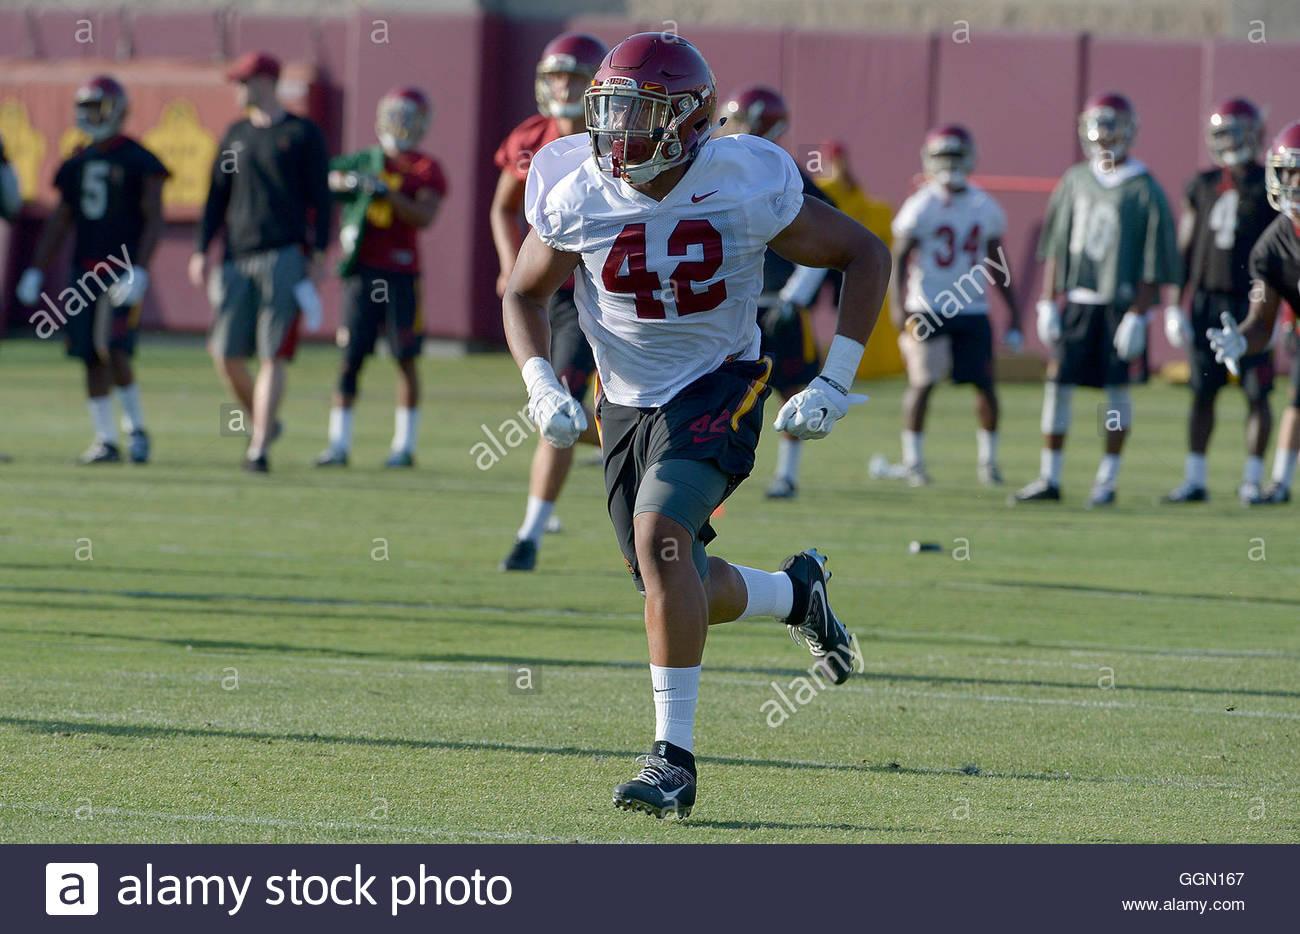 Los Angeles, California, USA. 5th Aug, 2016. USC linebacker Uchenna Nwosu (42) during football practice at Howard - Stock Image